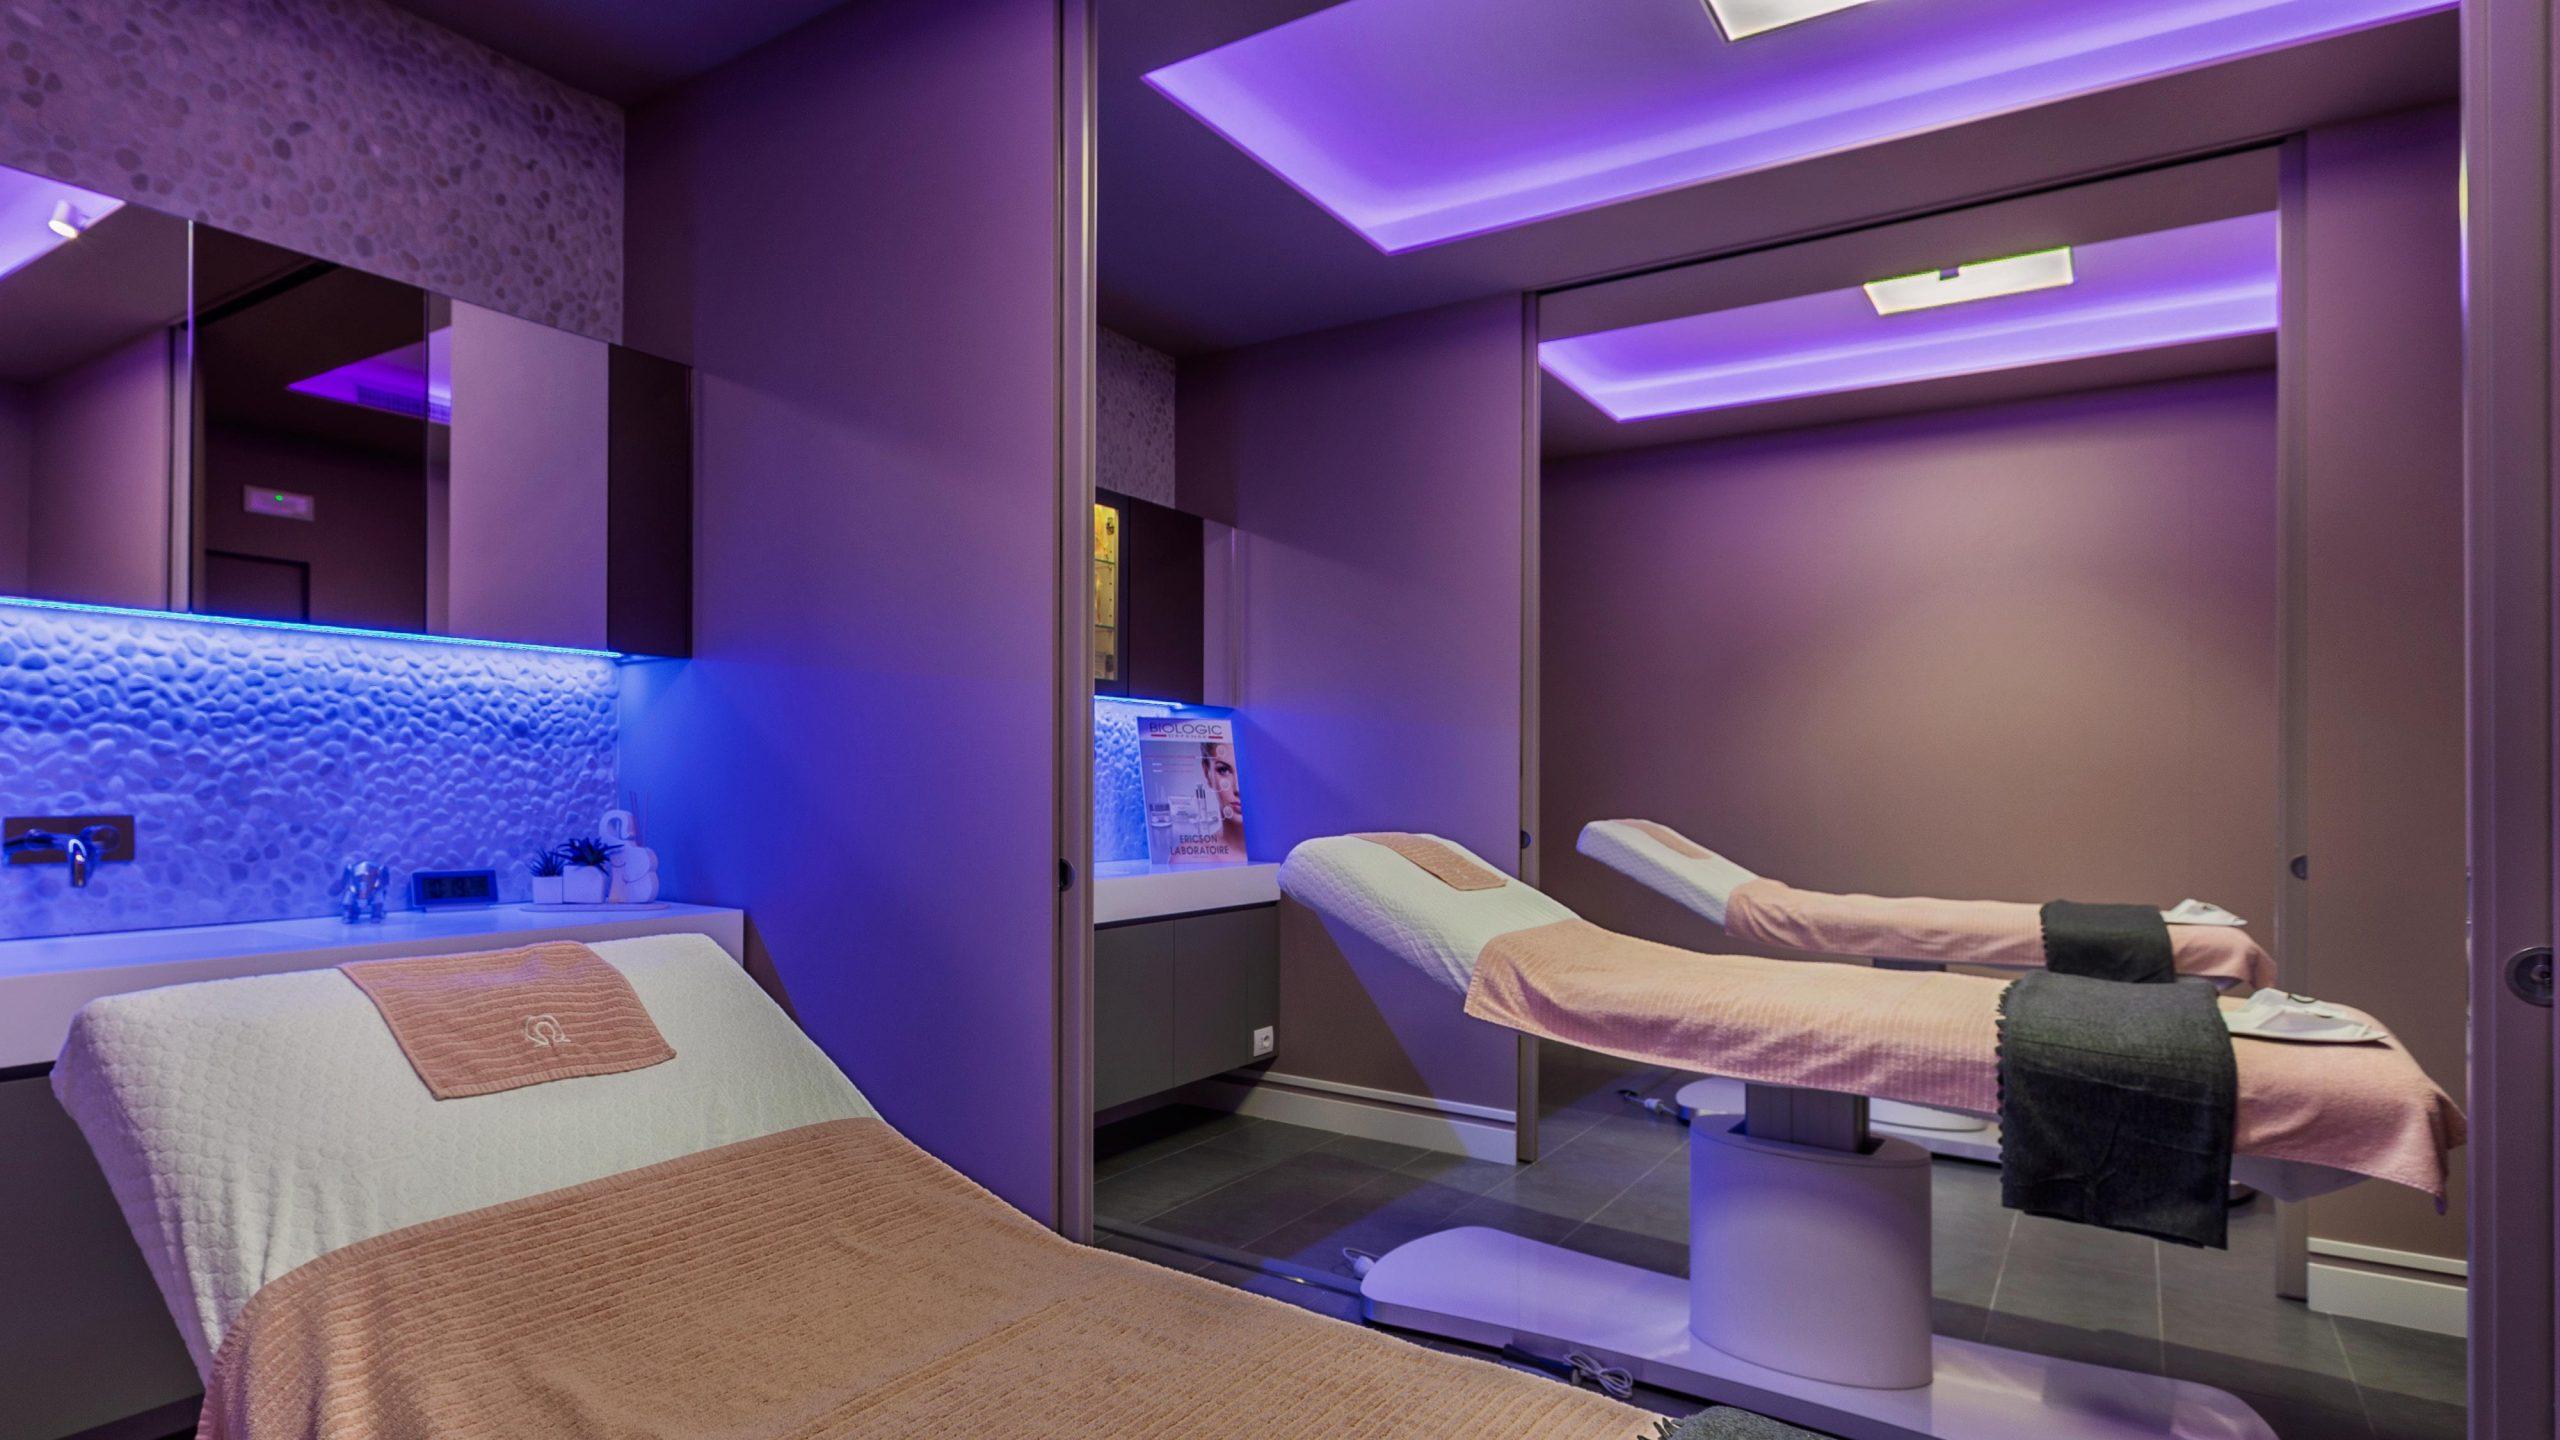 centro massaggi barletta